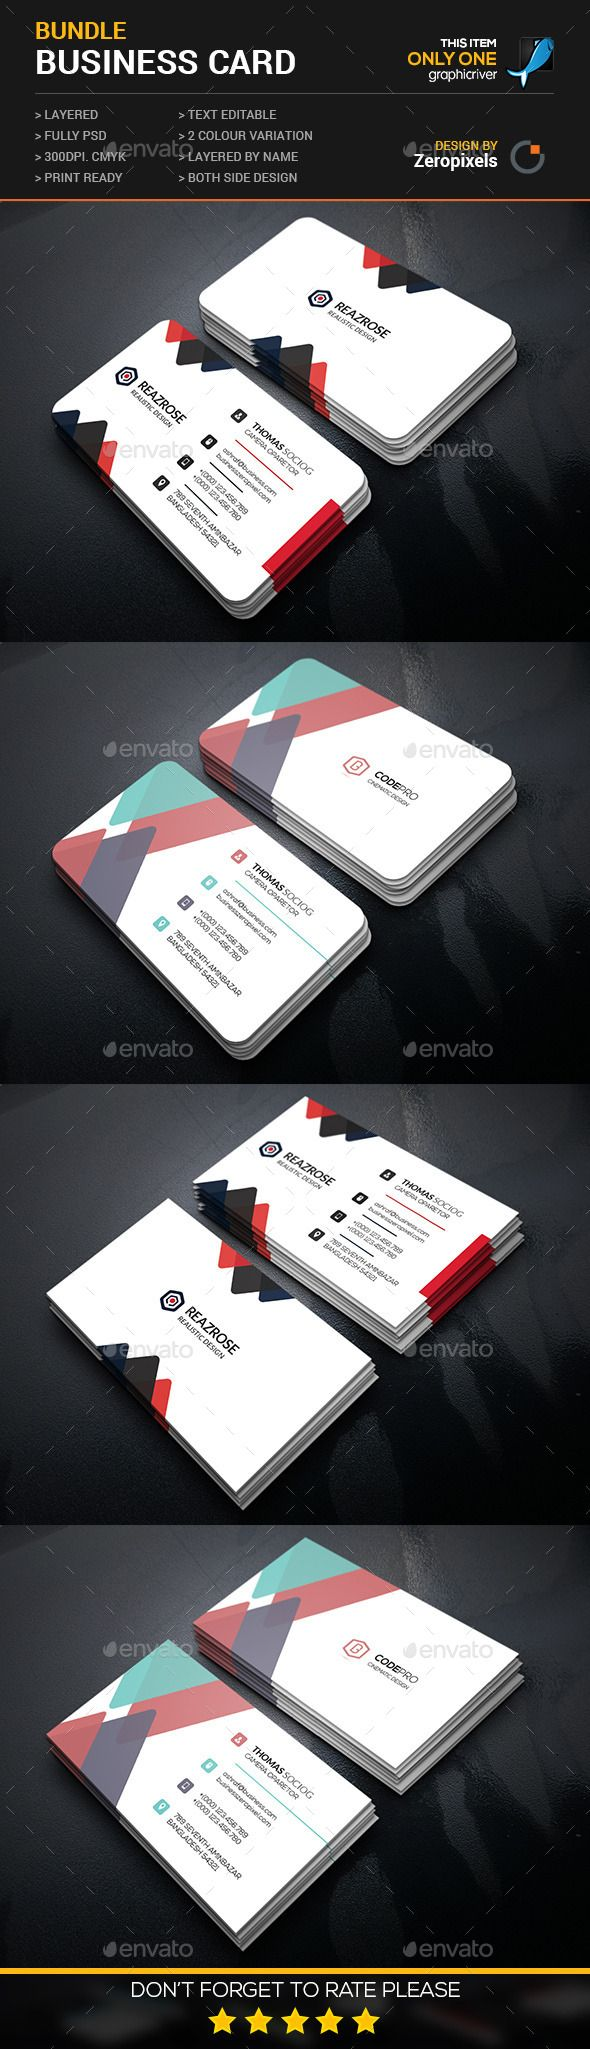 43 best business cards images on pinterest business card design